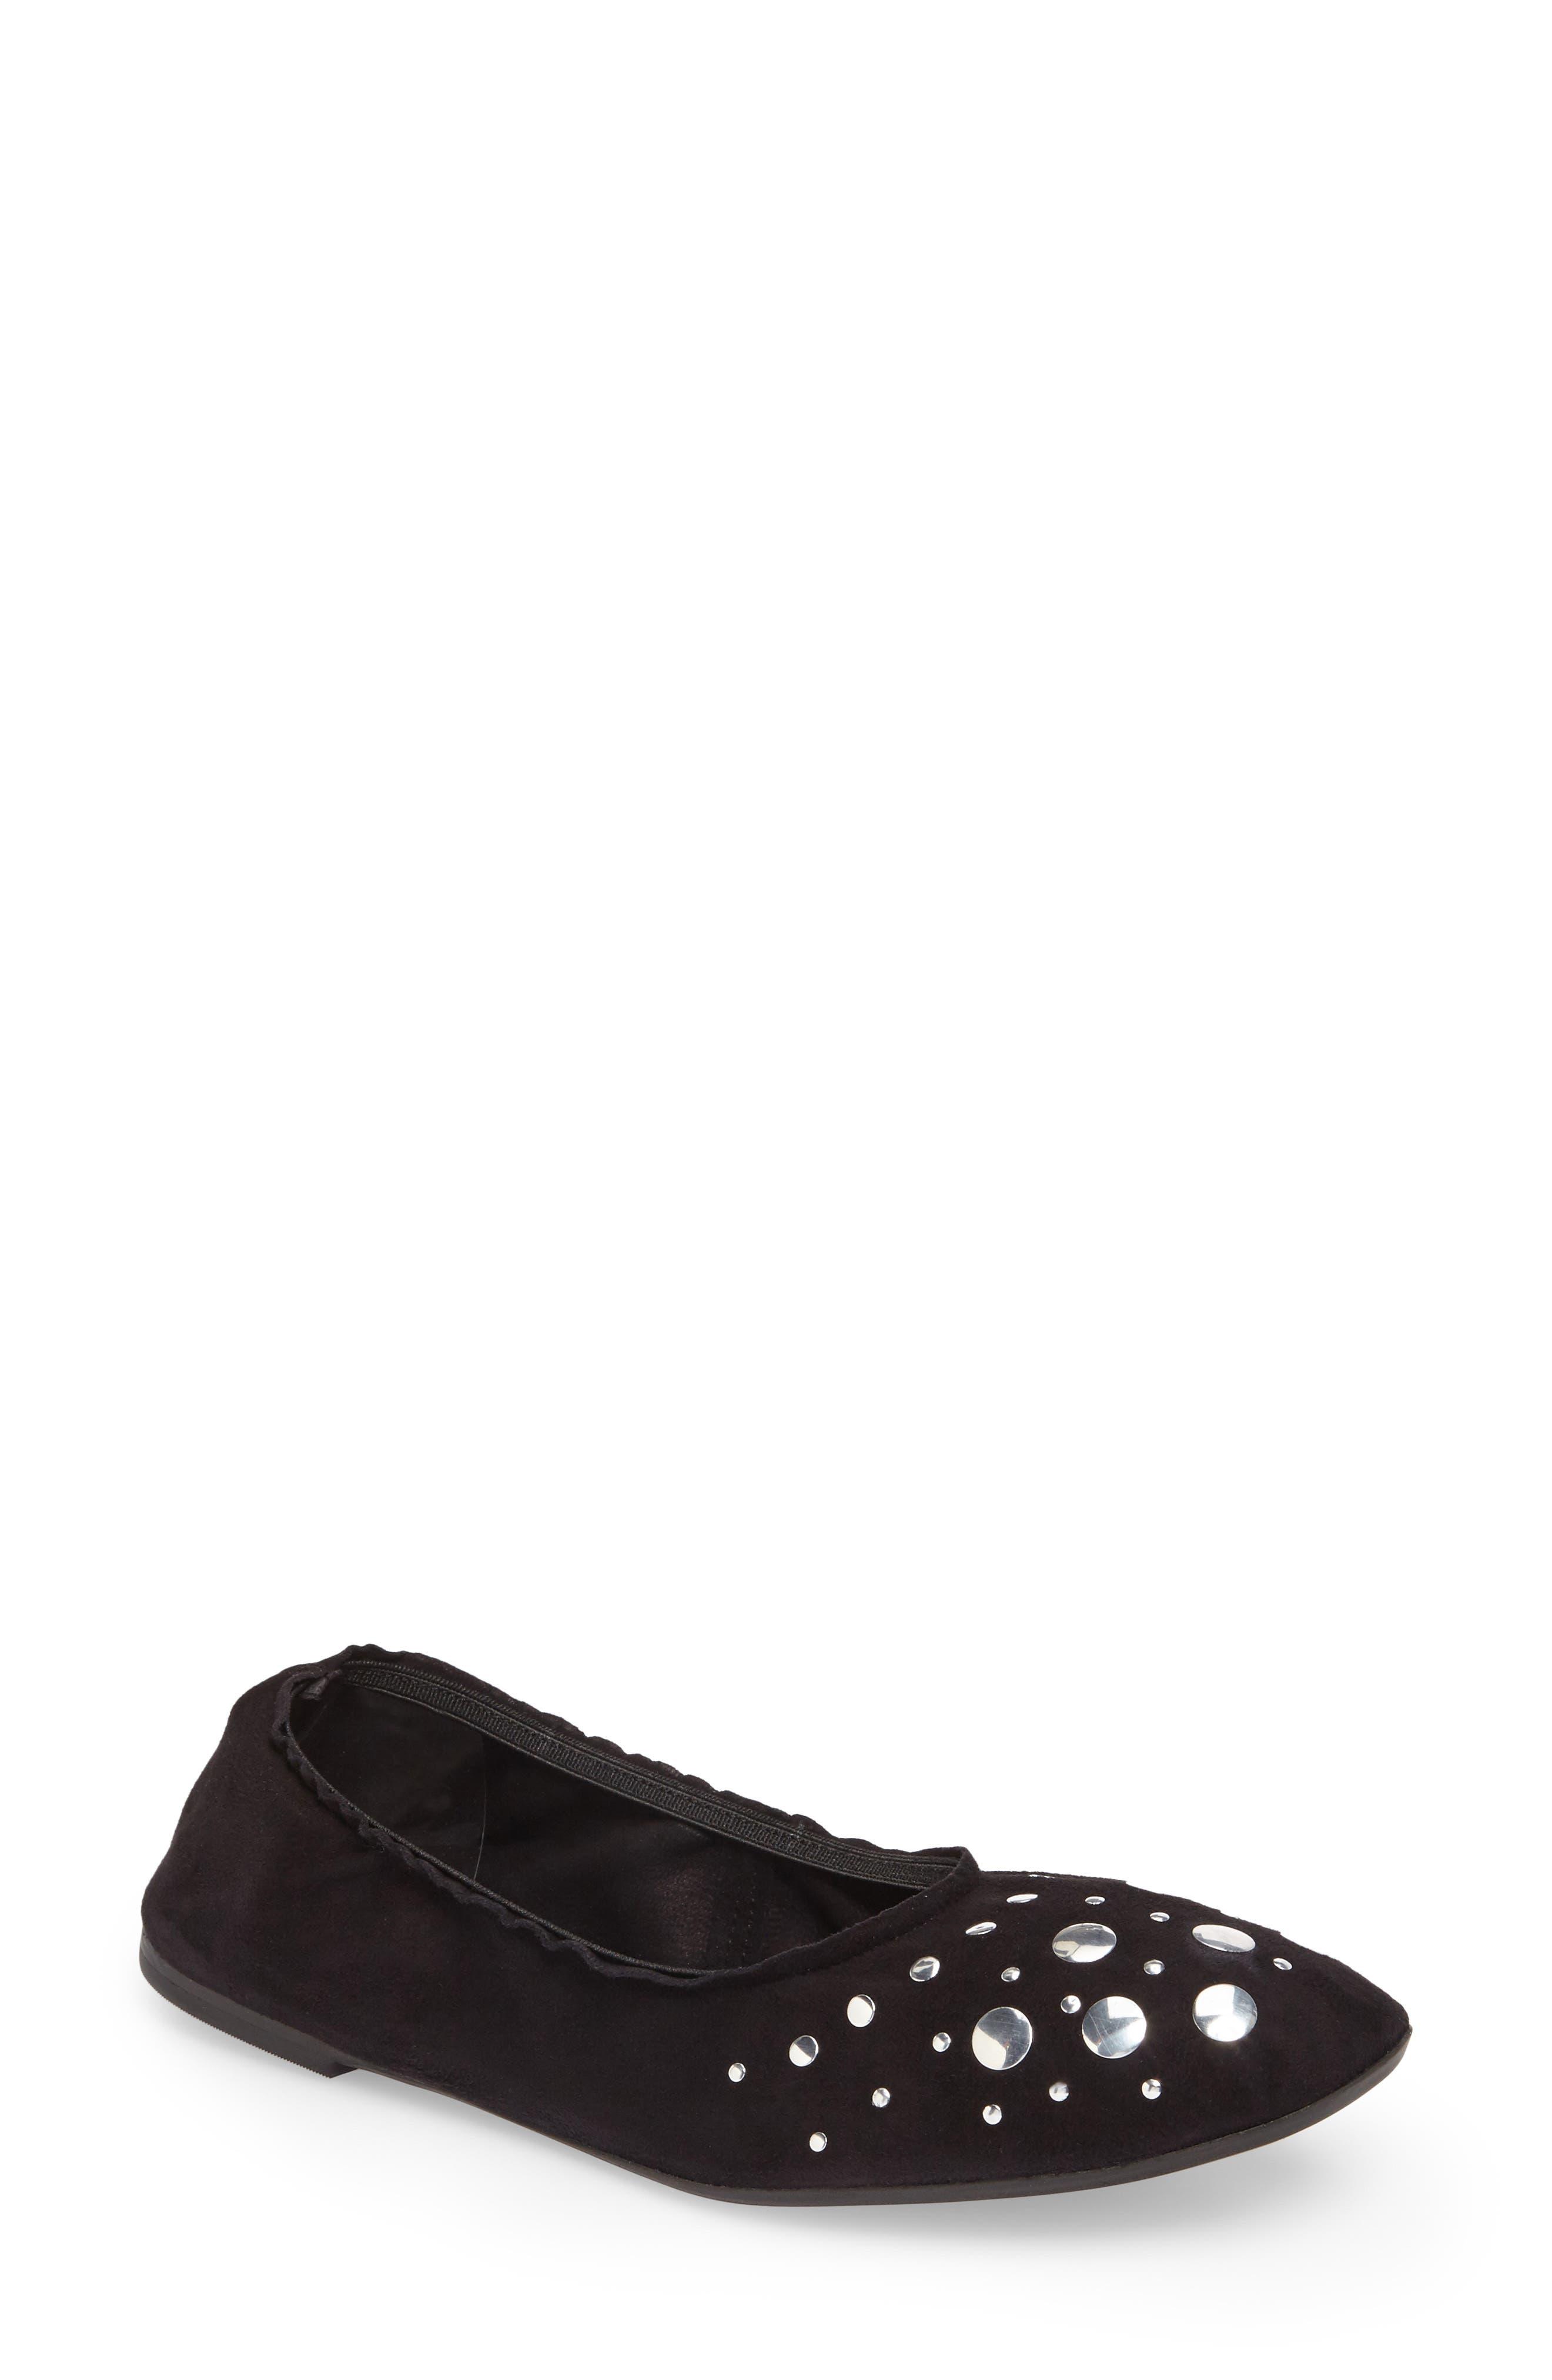 Jacob Ballet Flat,                             Main thumbnail 1, color,                             Black Leather